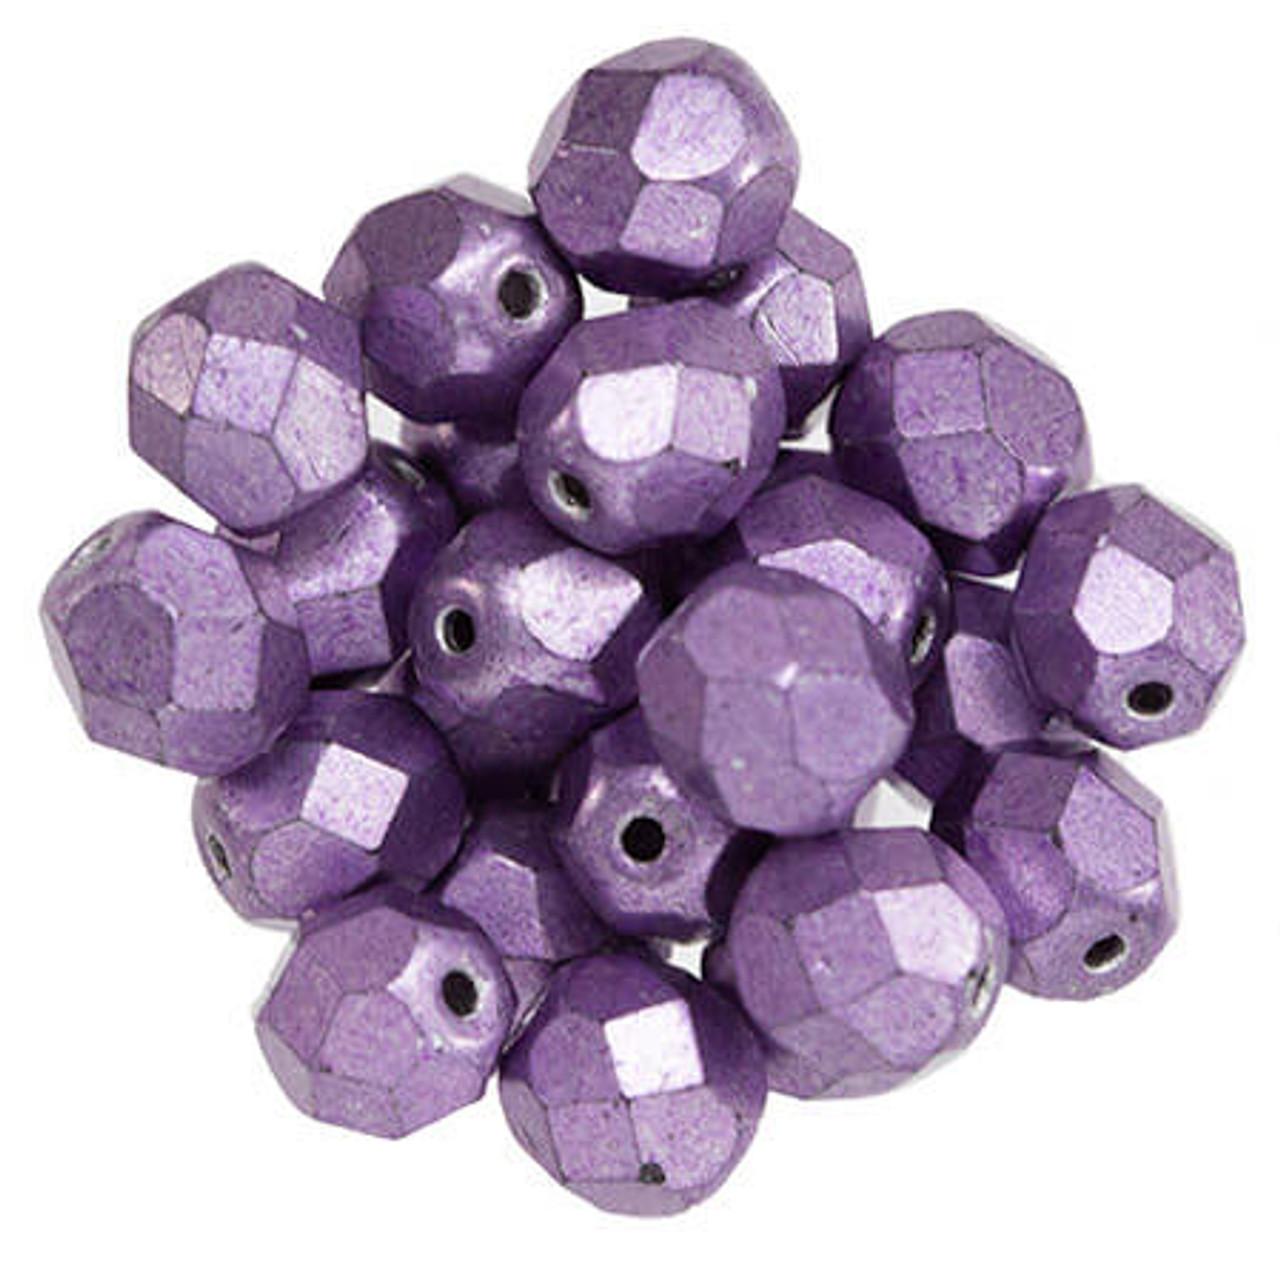 25 6mm Czech Glass Firepolish Beads Saturated Purple